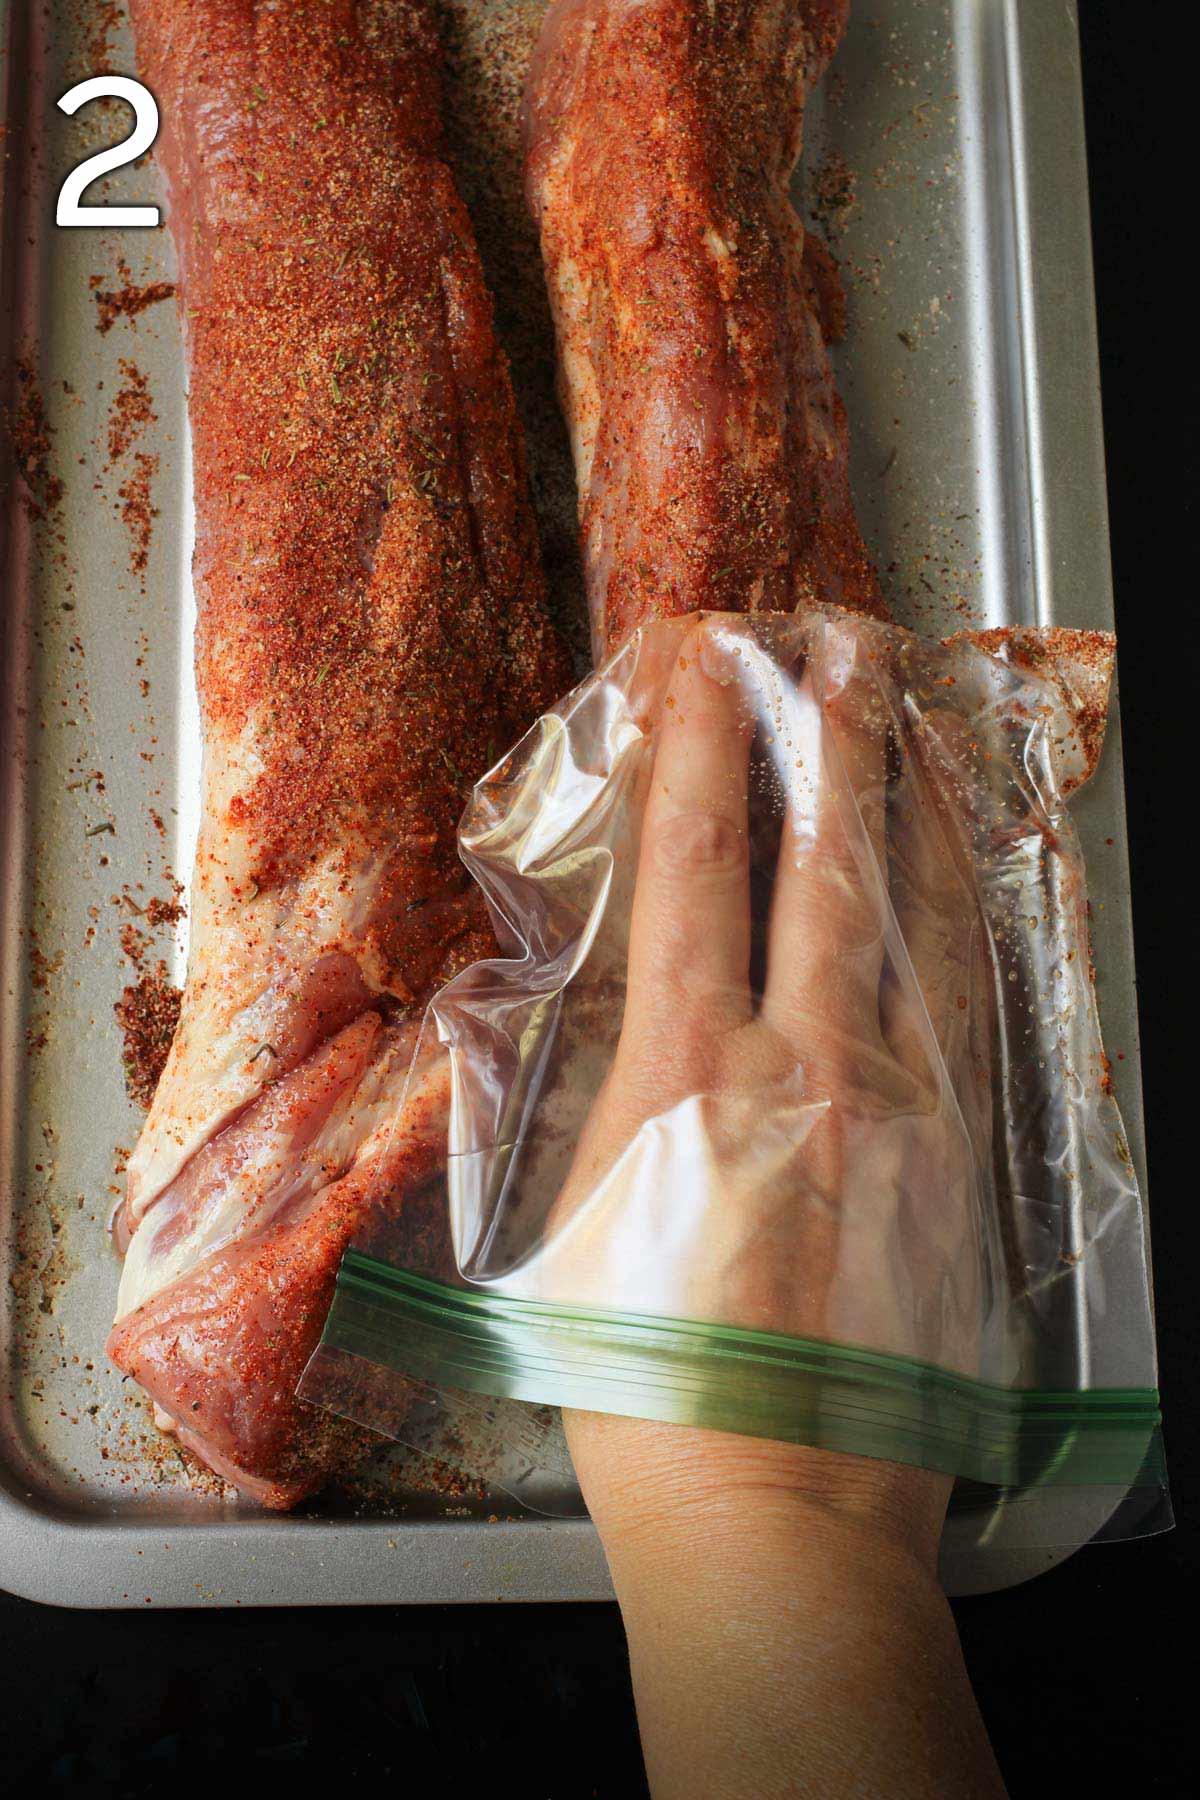 hand in plastic bag rubbing on spice rub.